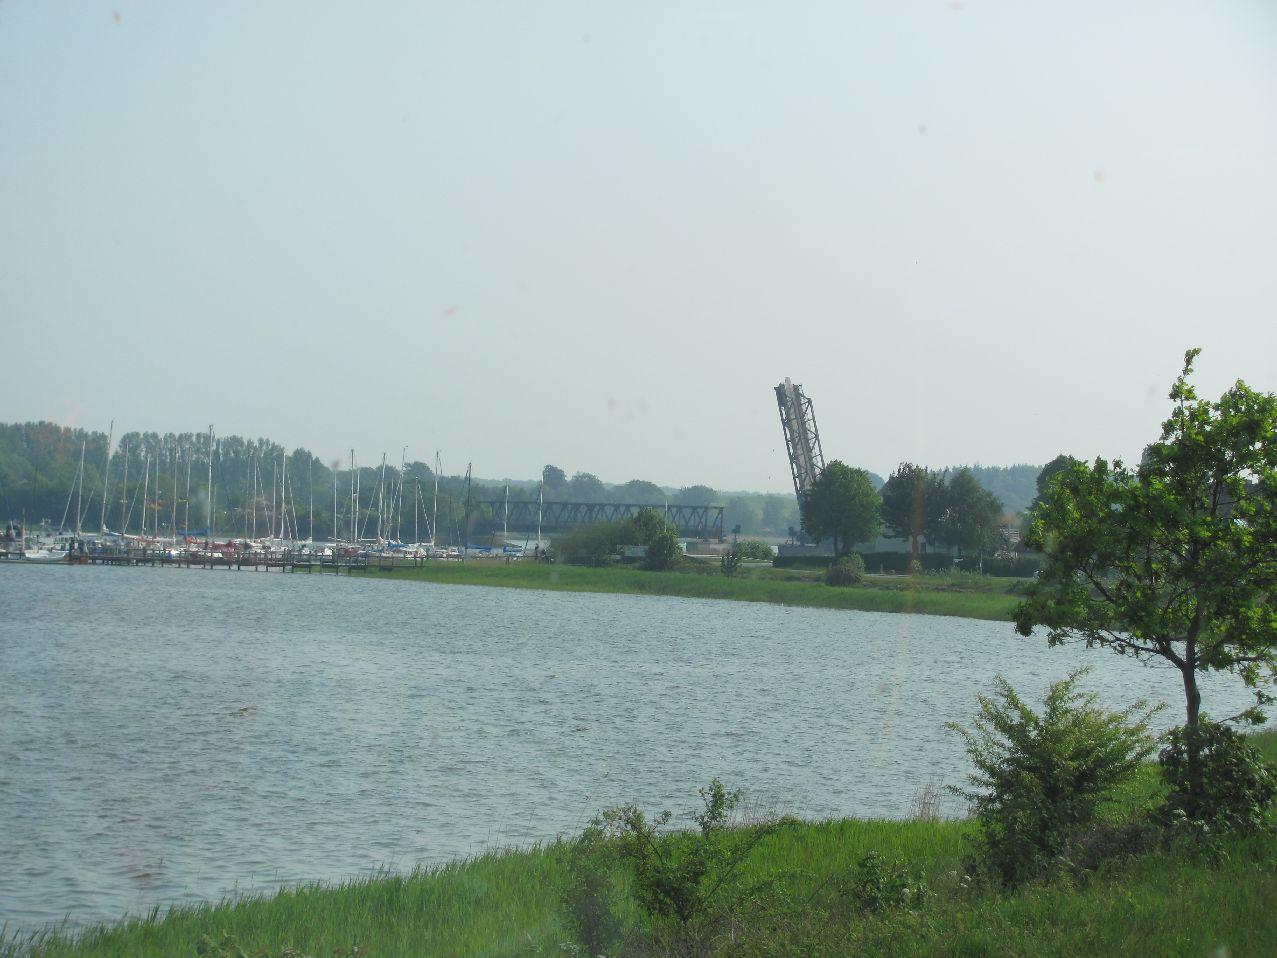 cdu-schleswigfahrt-2011_16